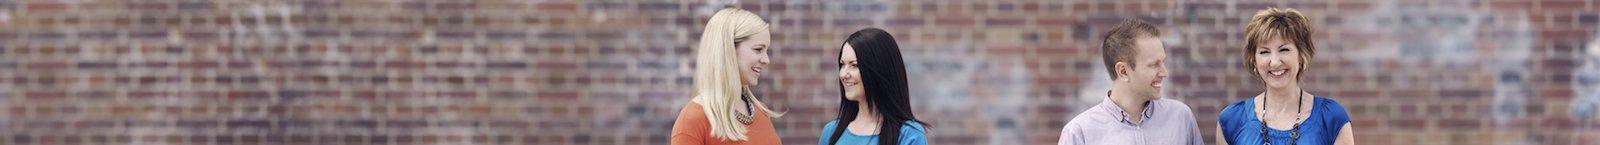 Jobs at Shine | Shine Lawyers